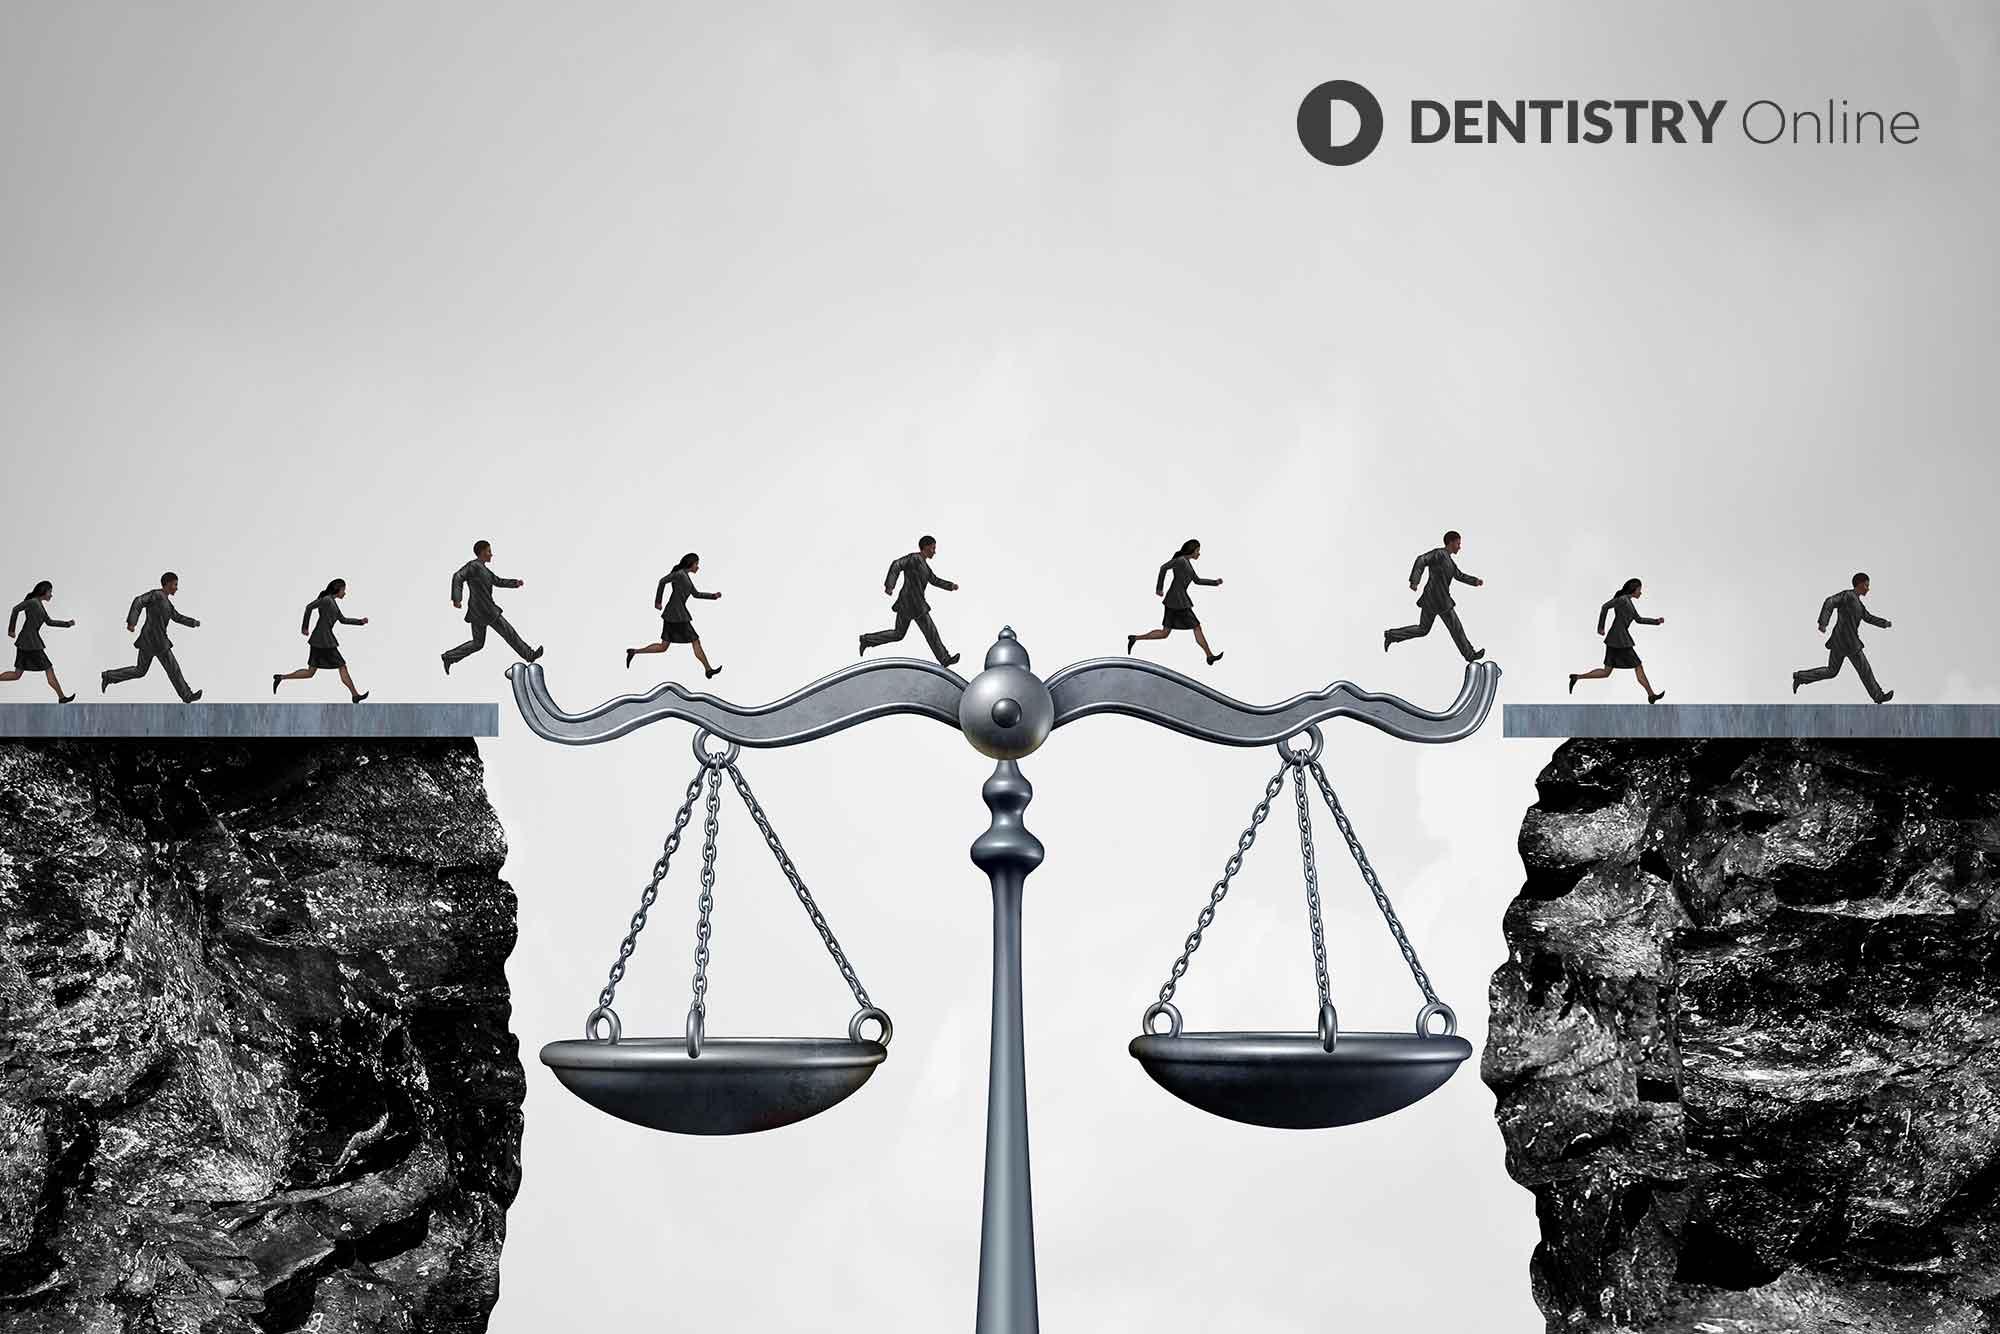 bridging the gap between dental and law